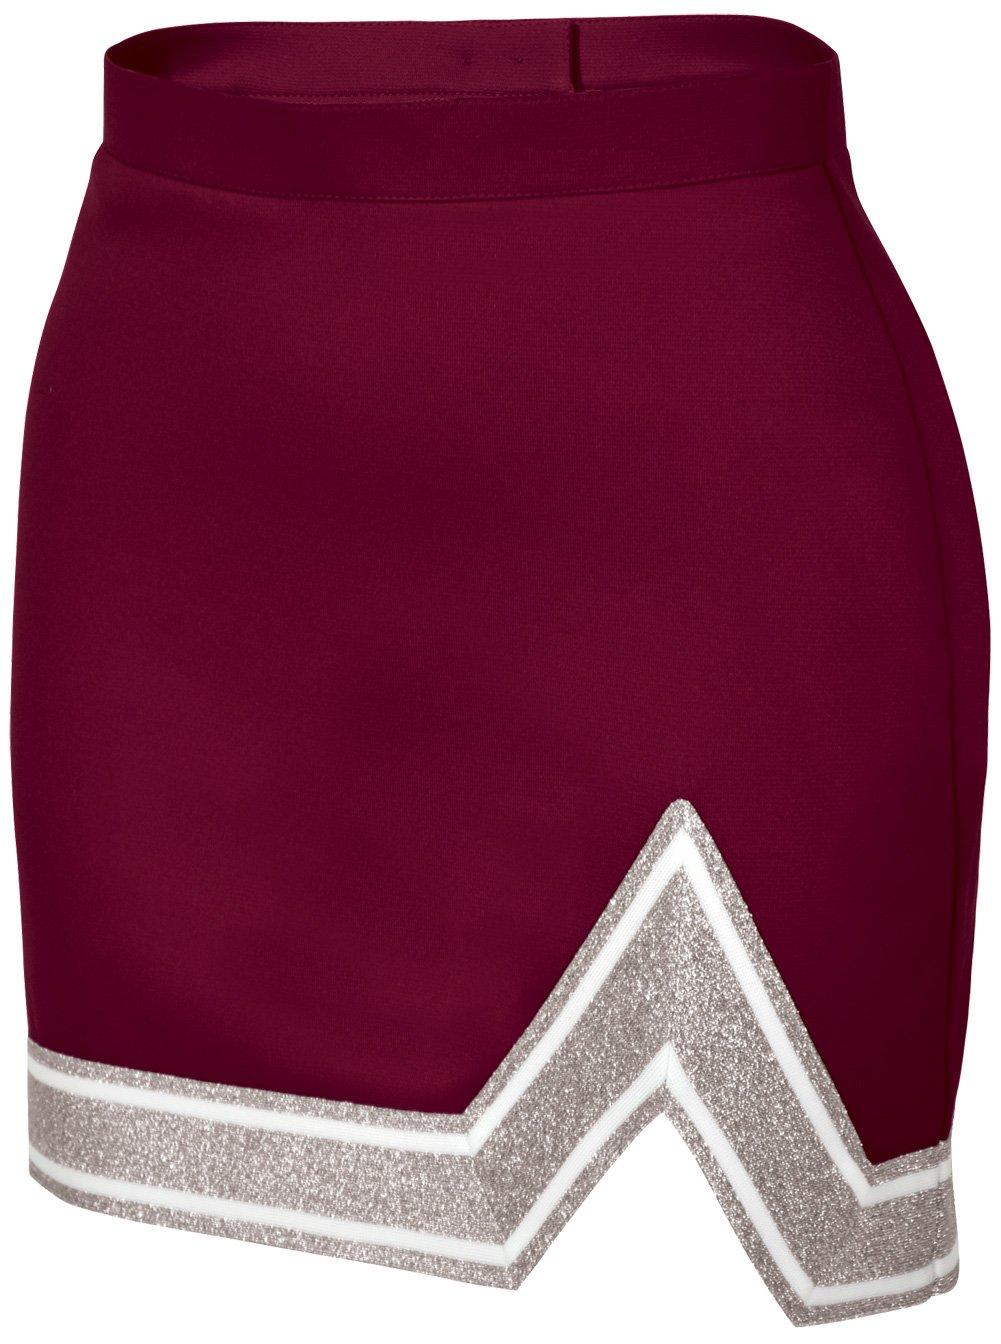 Chassé Womens' Blaze Skirt Maroon/White/Metallic Silver Adult X-Small